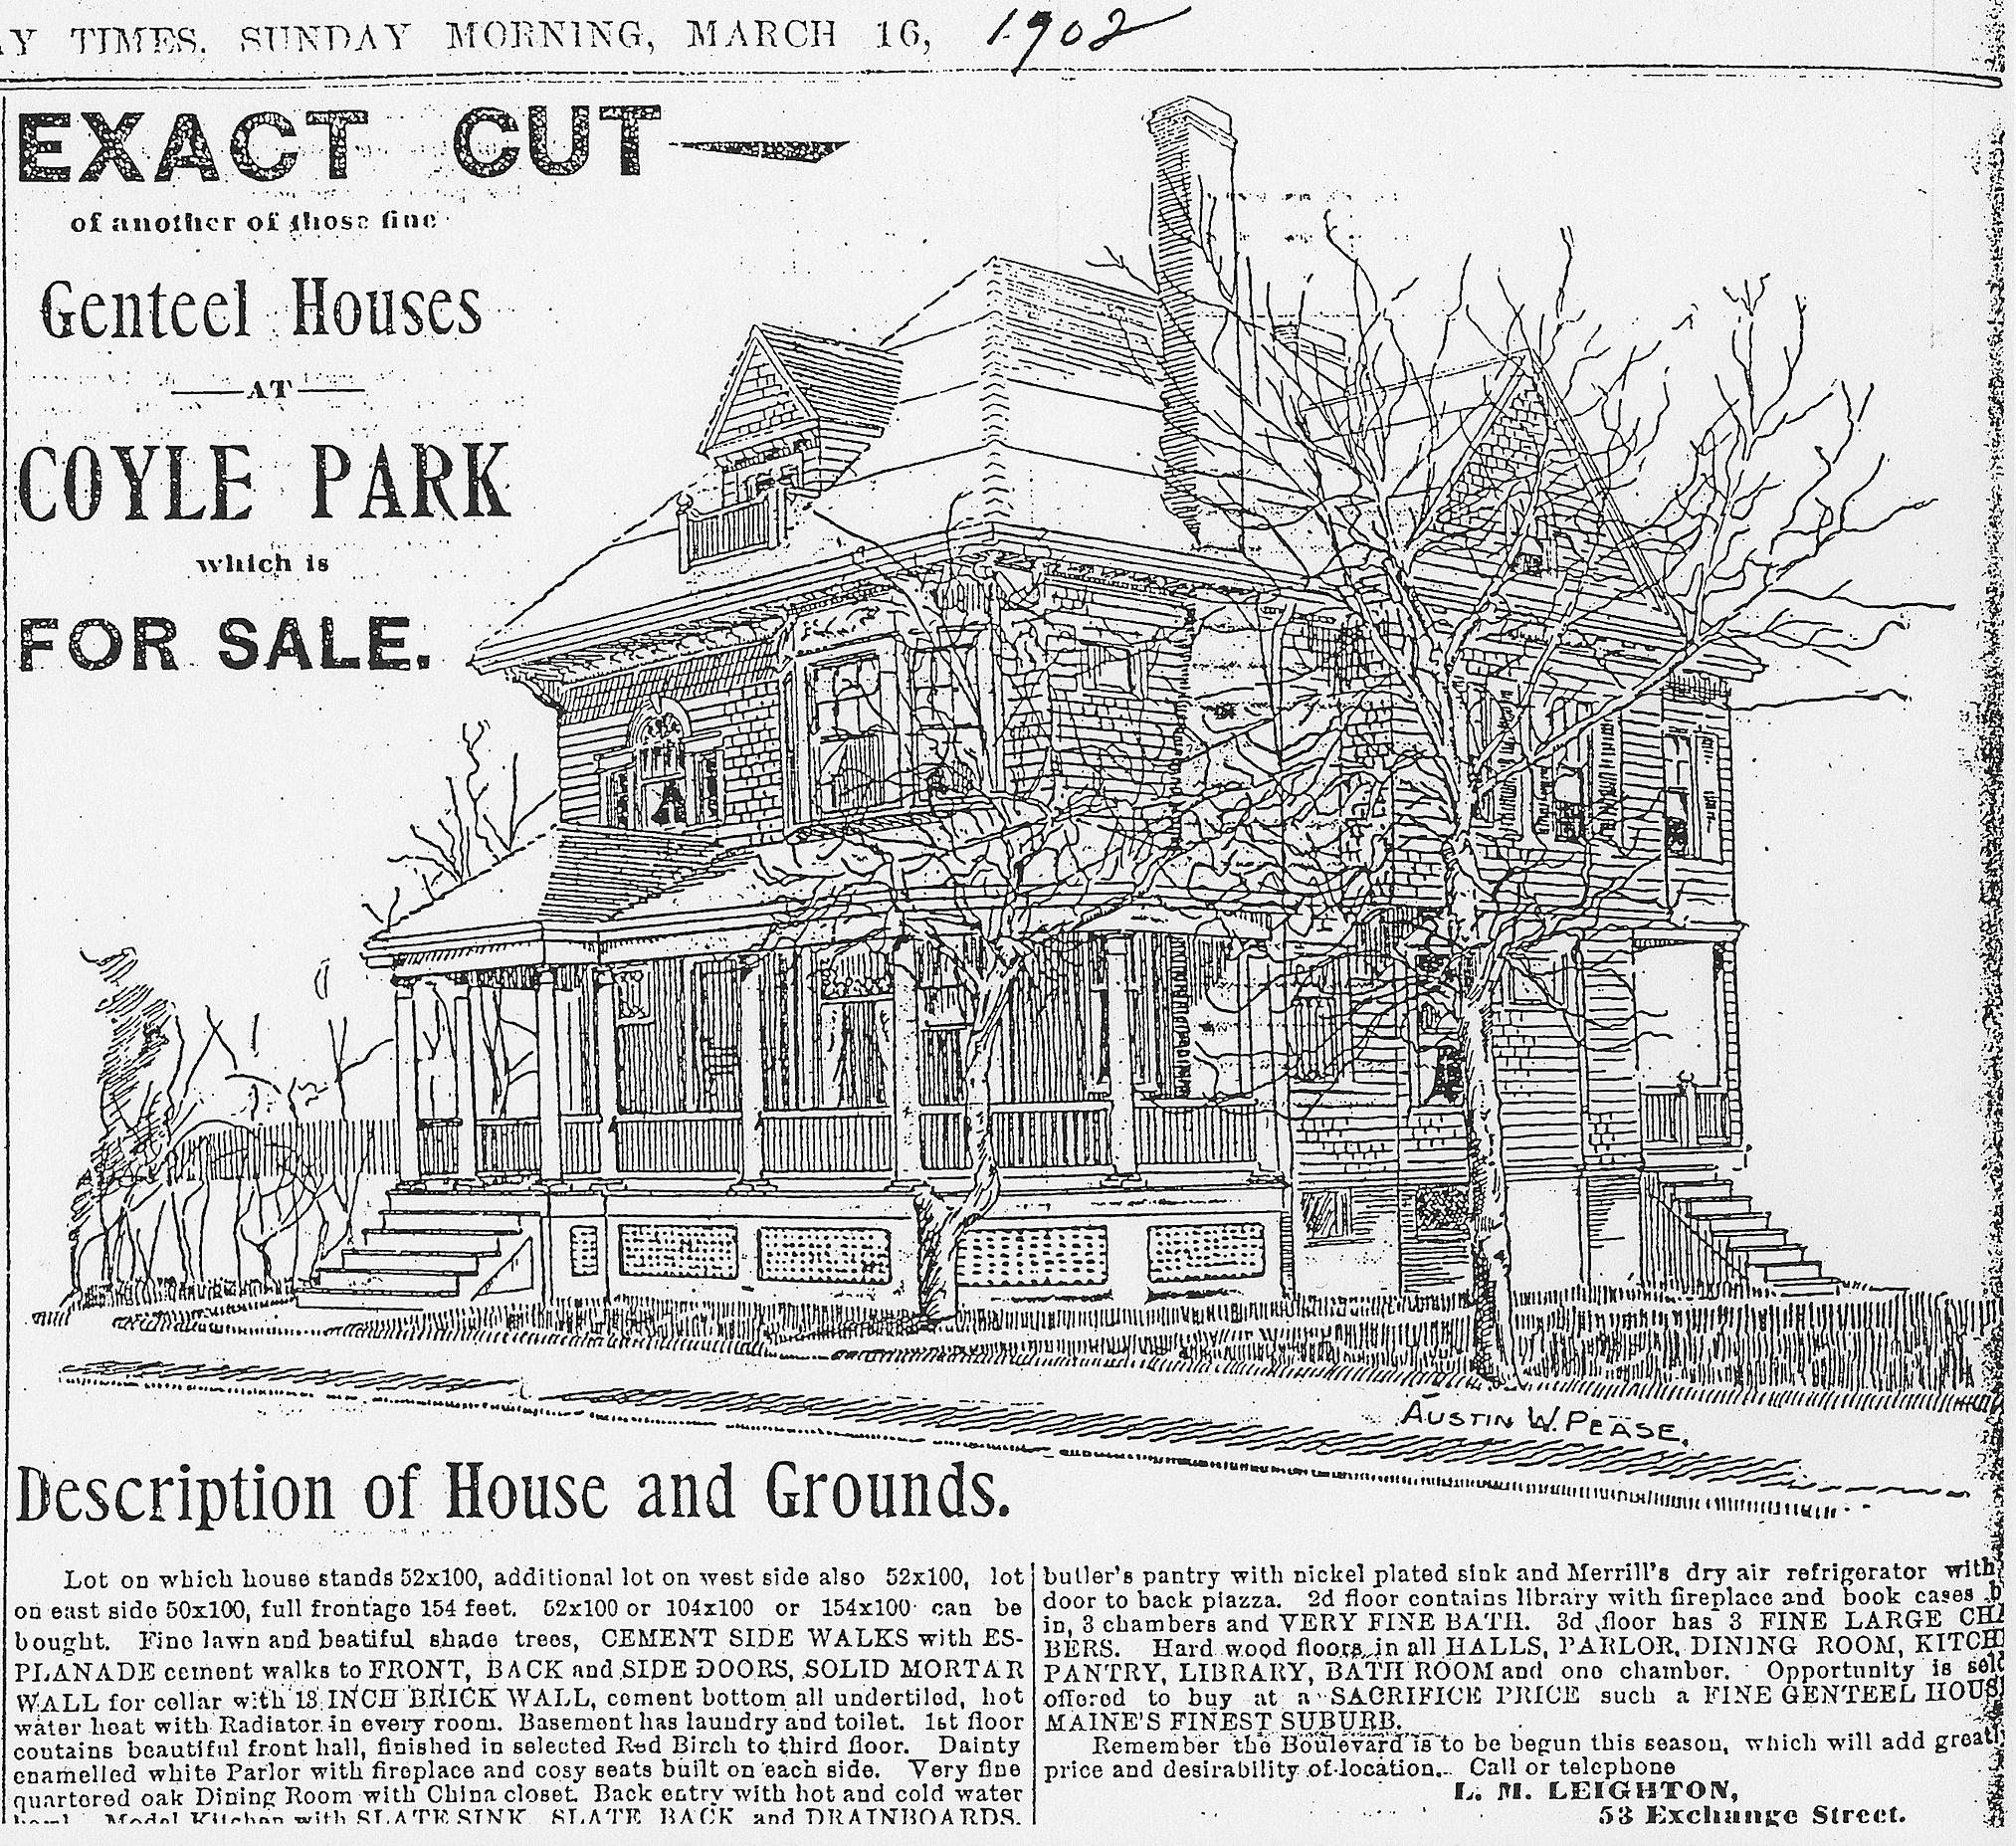 Portland Sunday Times, Sunday Morning, March 16, 1902